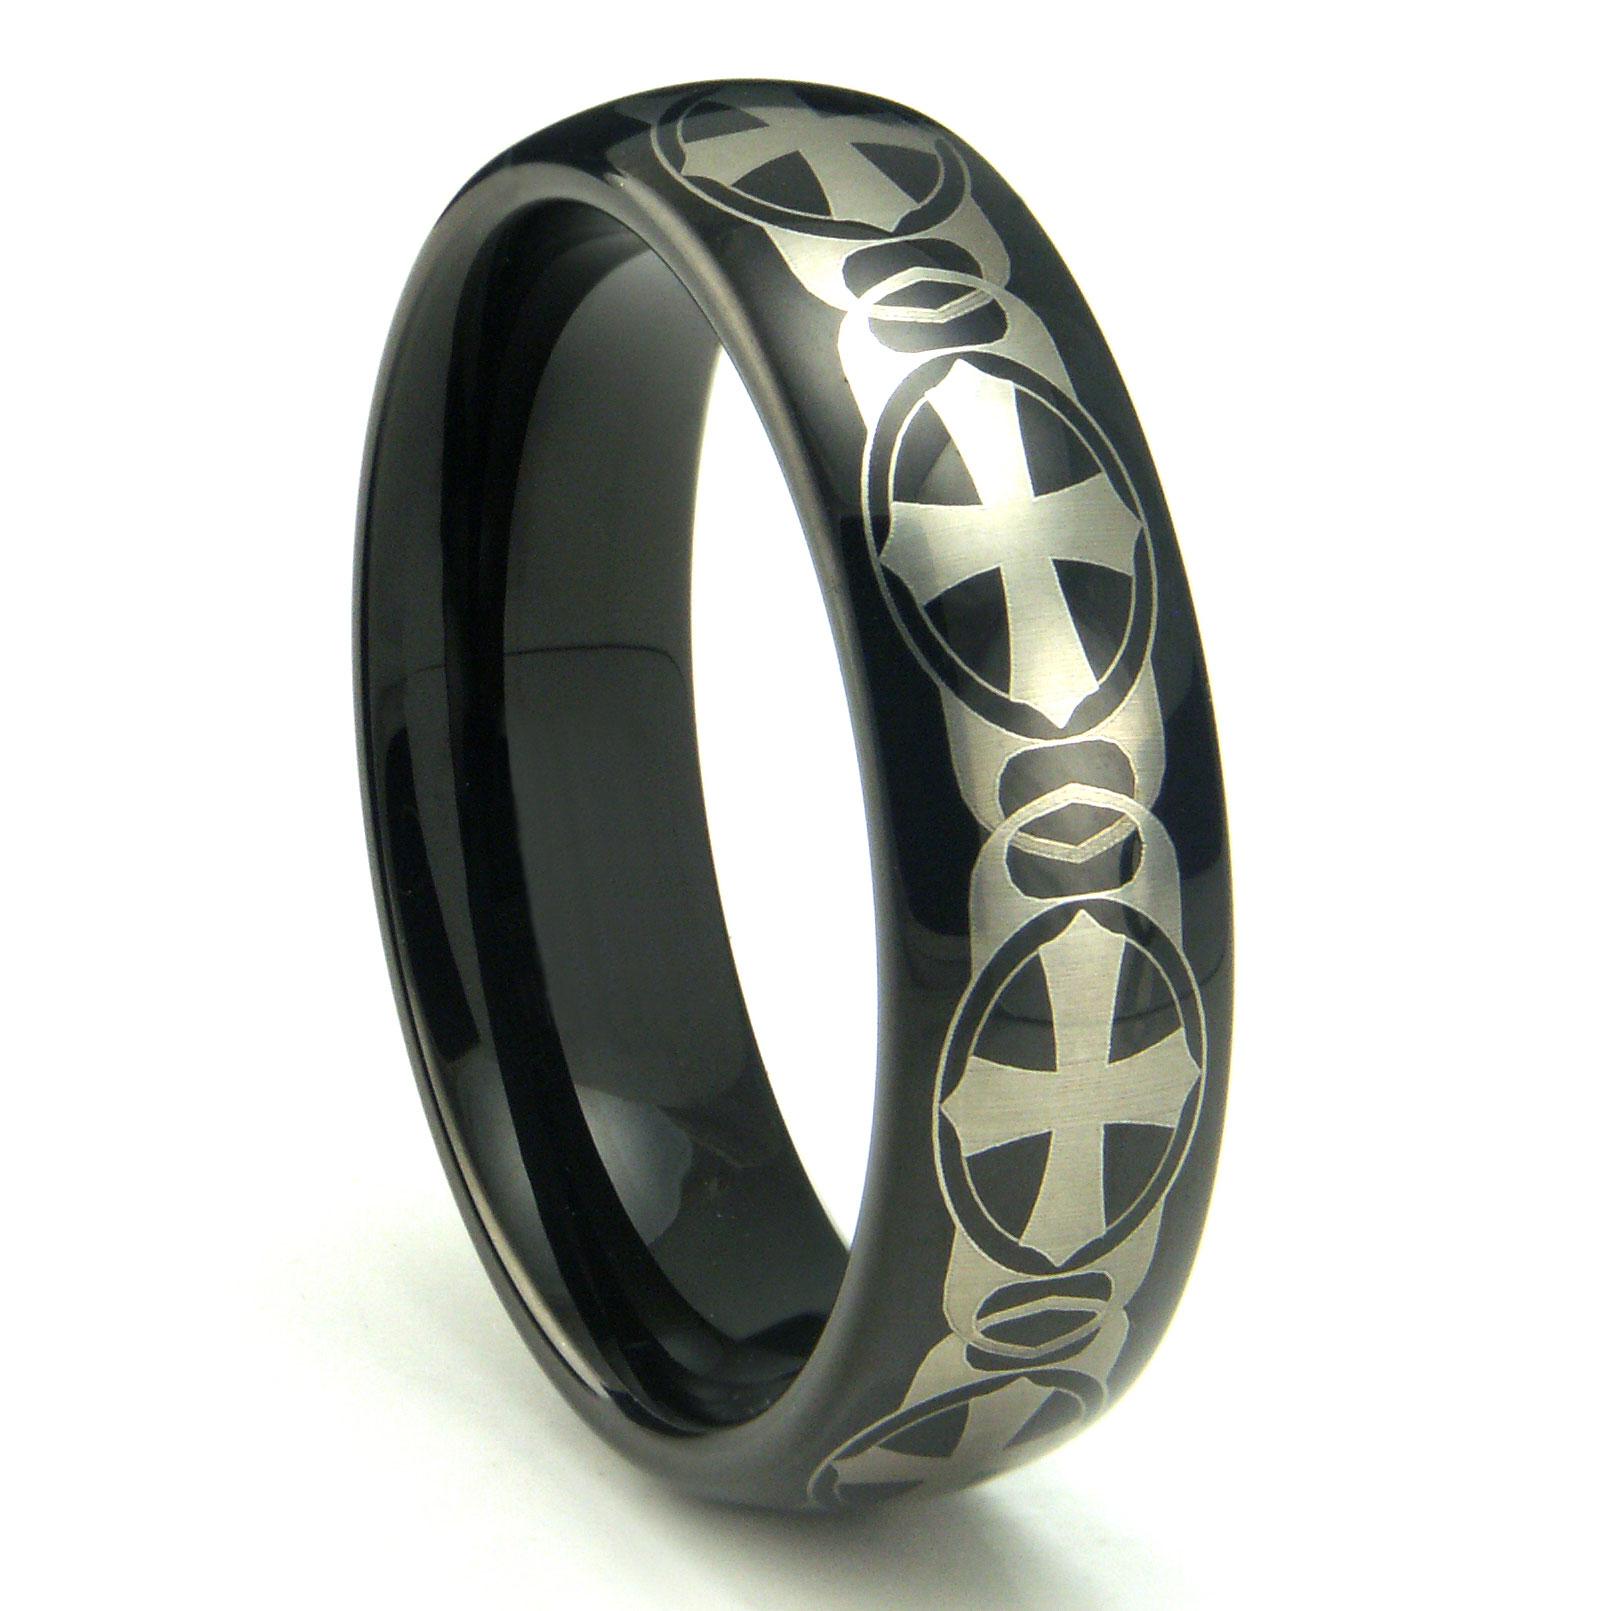 Black Tungsten Carbide Laser Engraved Celtic Cross Dome Wedding Band Ring P walmart wedding ring sets Loading zoom